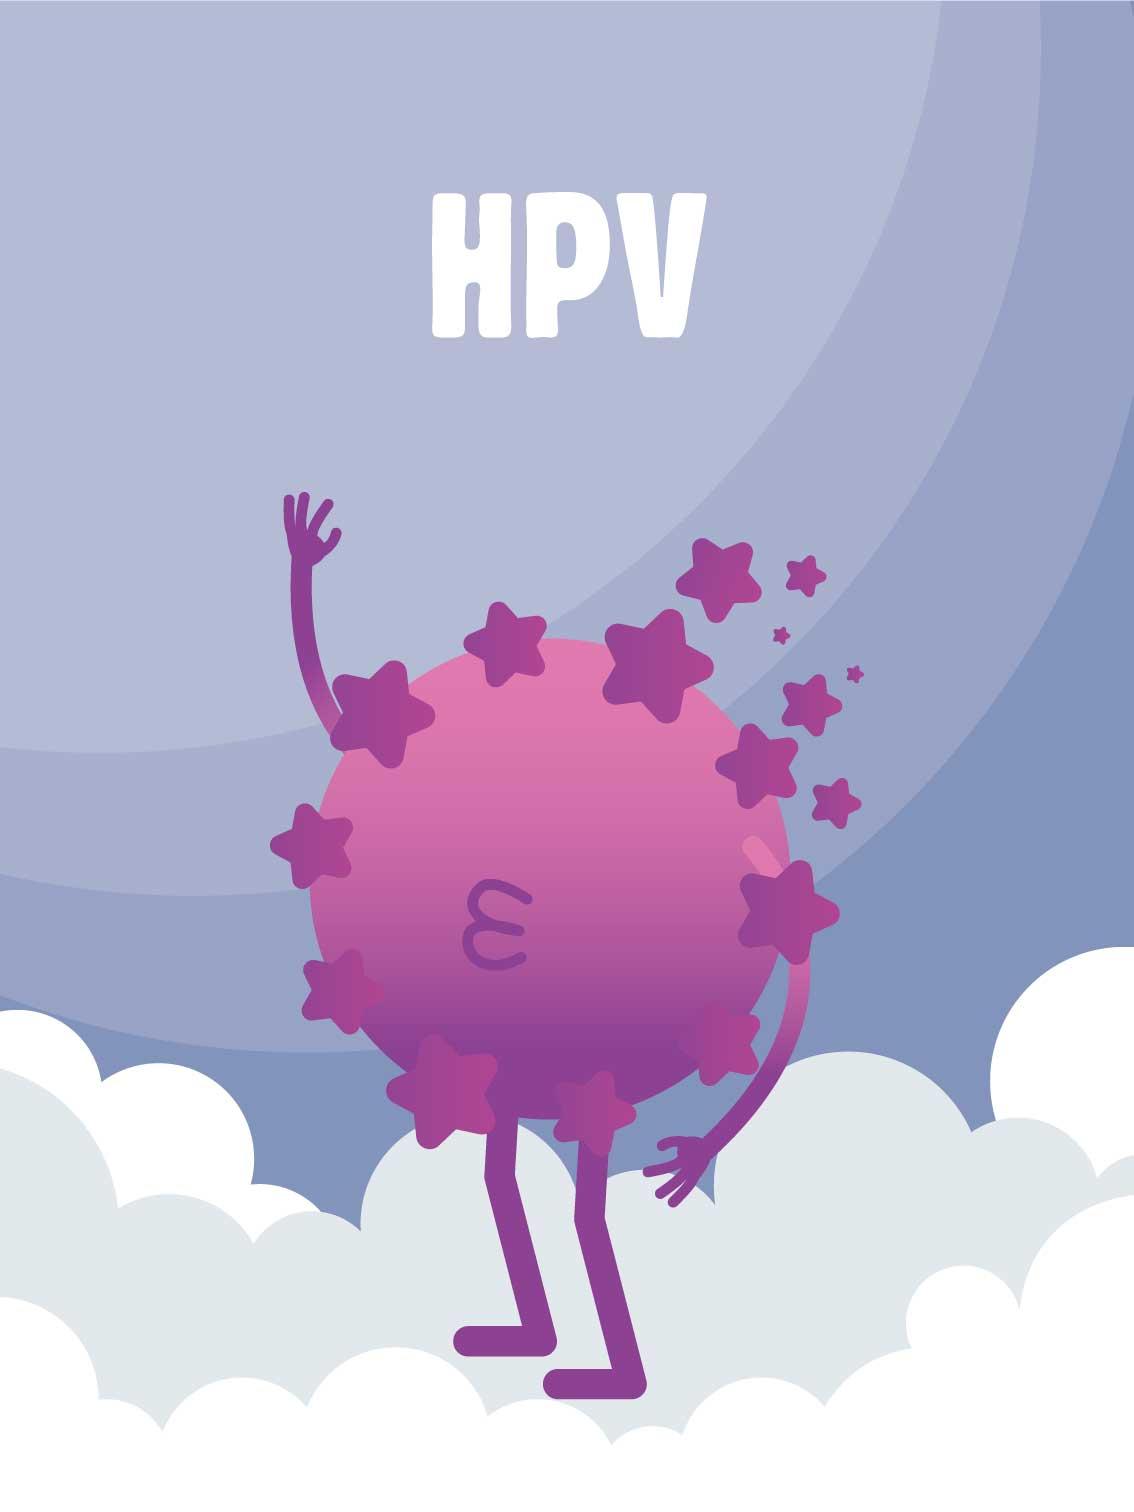 hpv negatif use